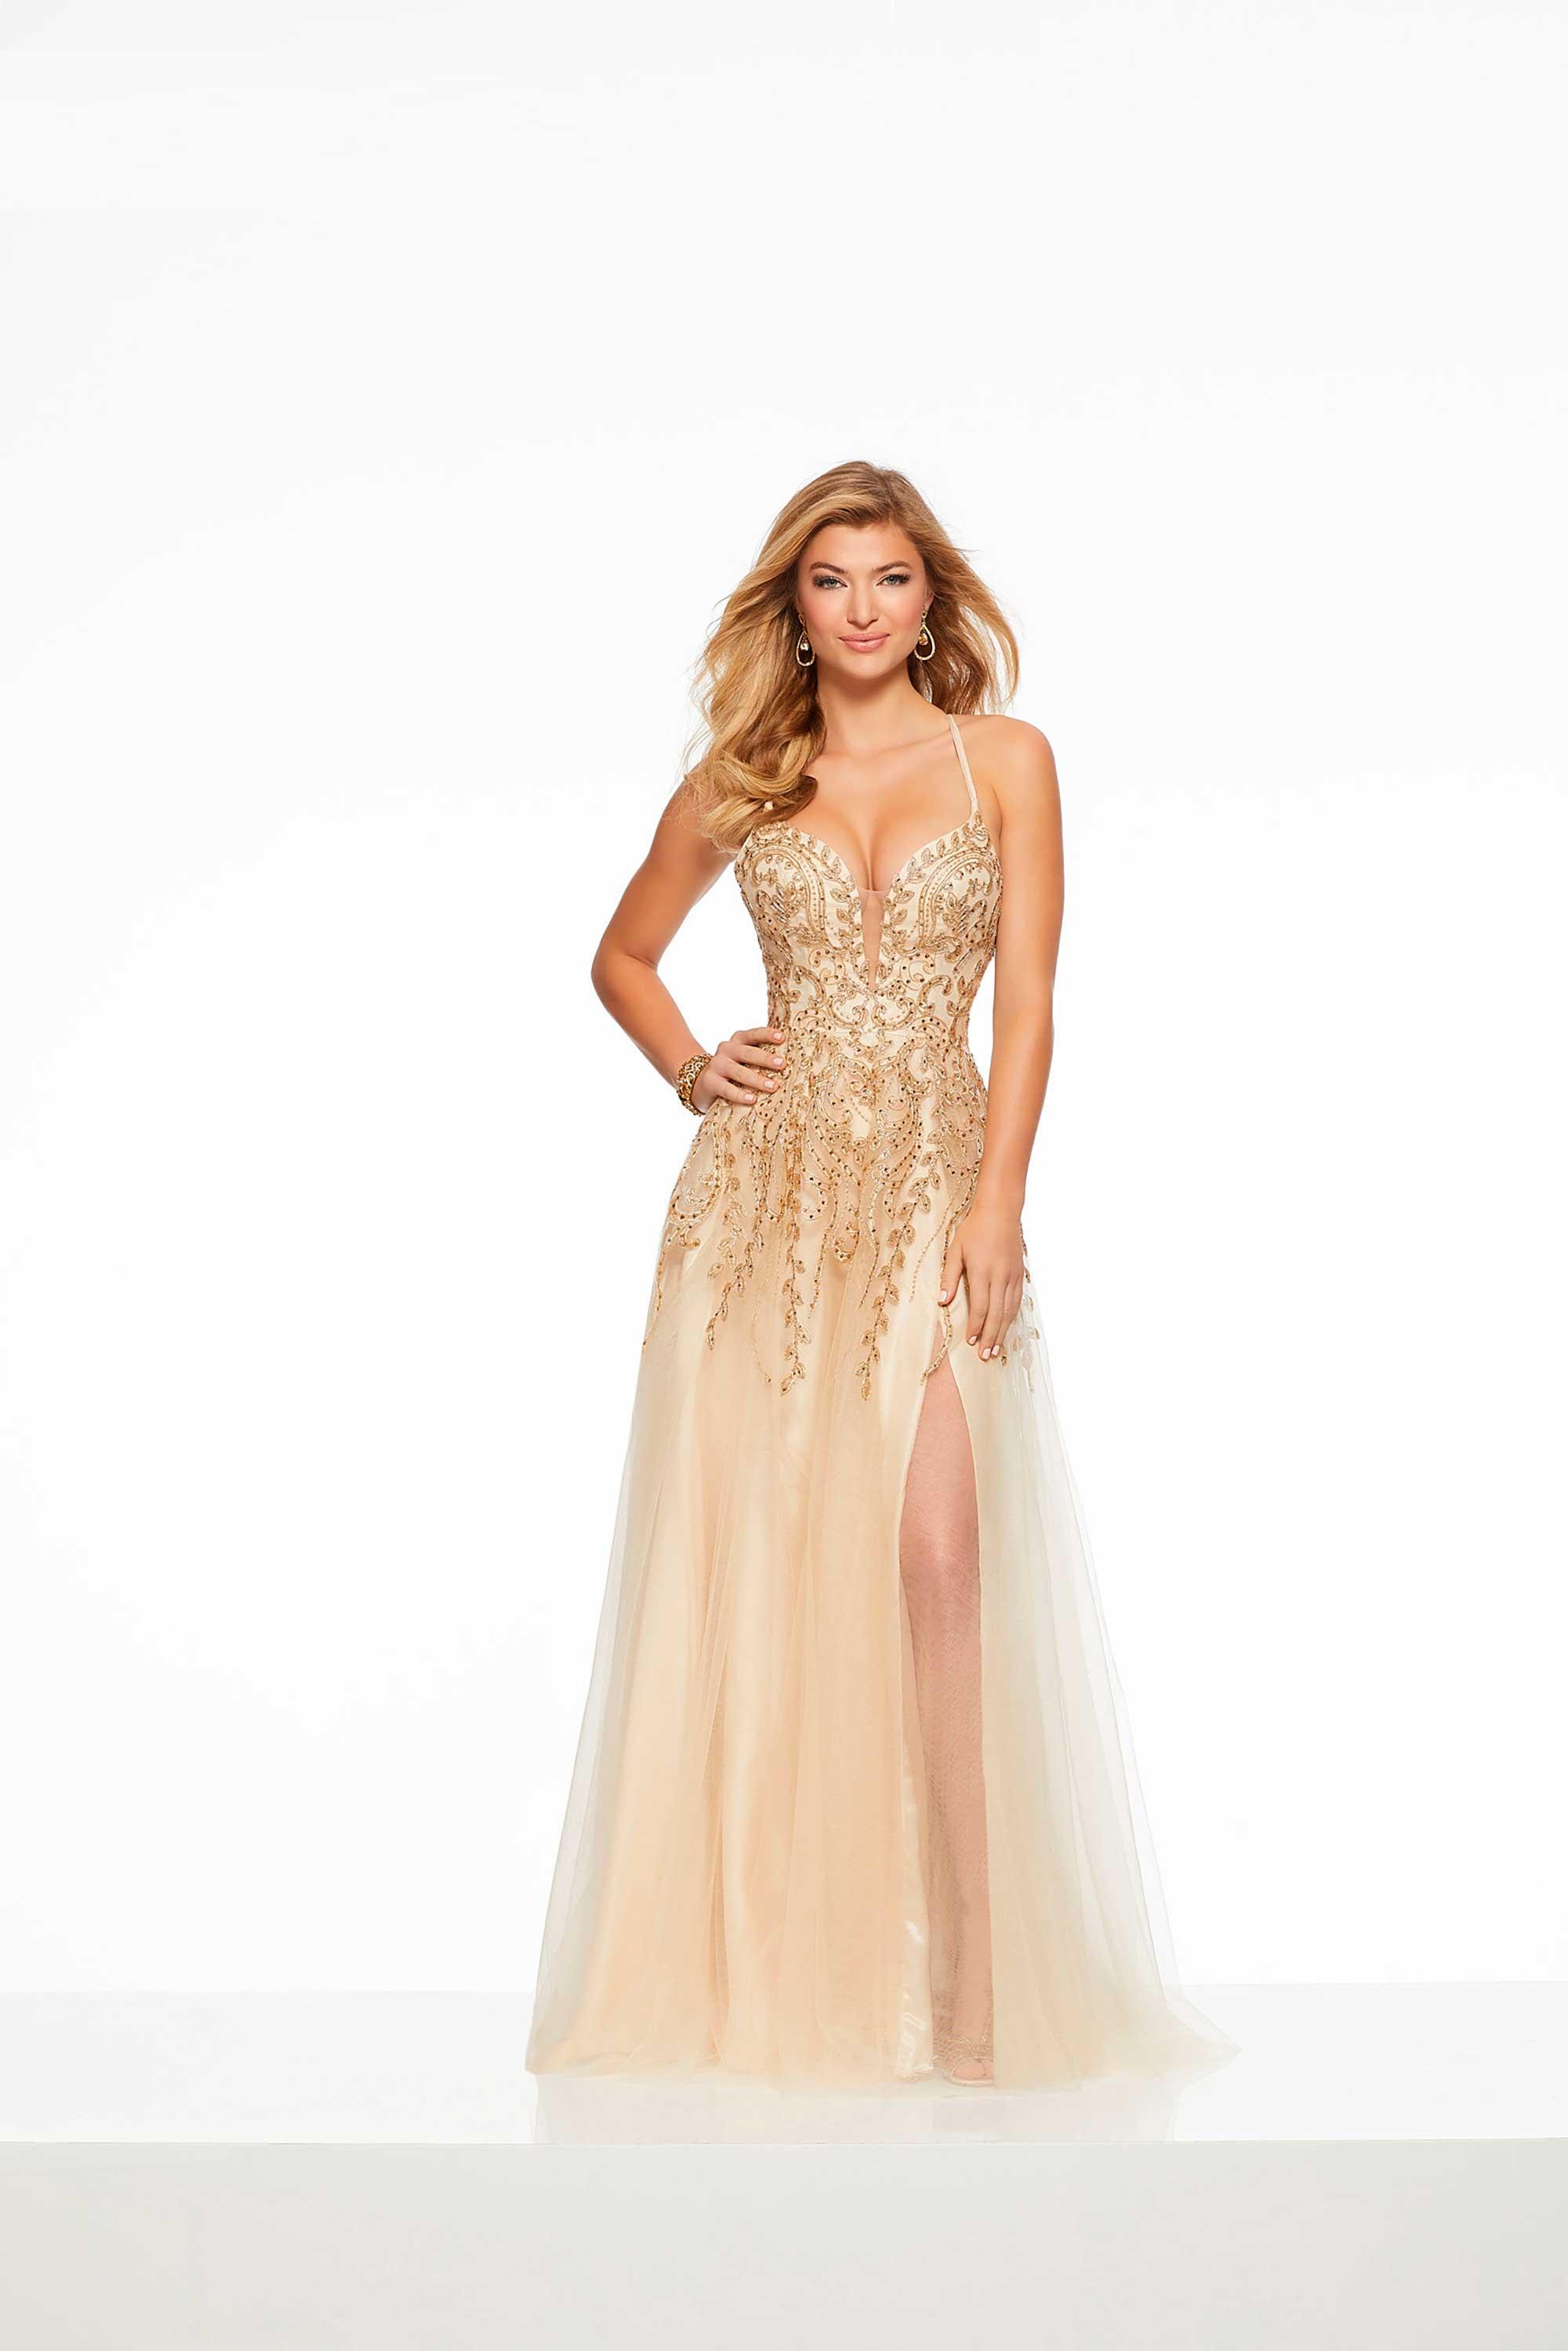 Vestido Lucía Fiesta 2019 mod. 43027 - 5